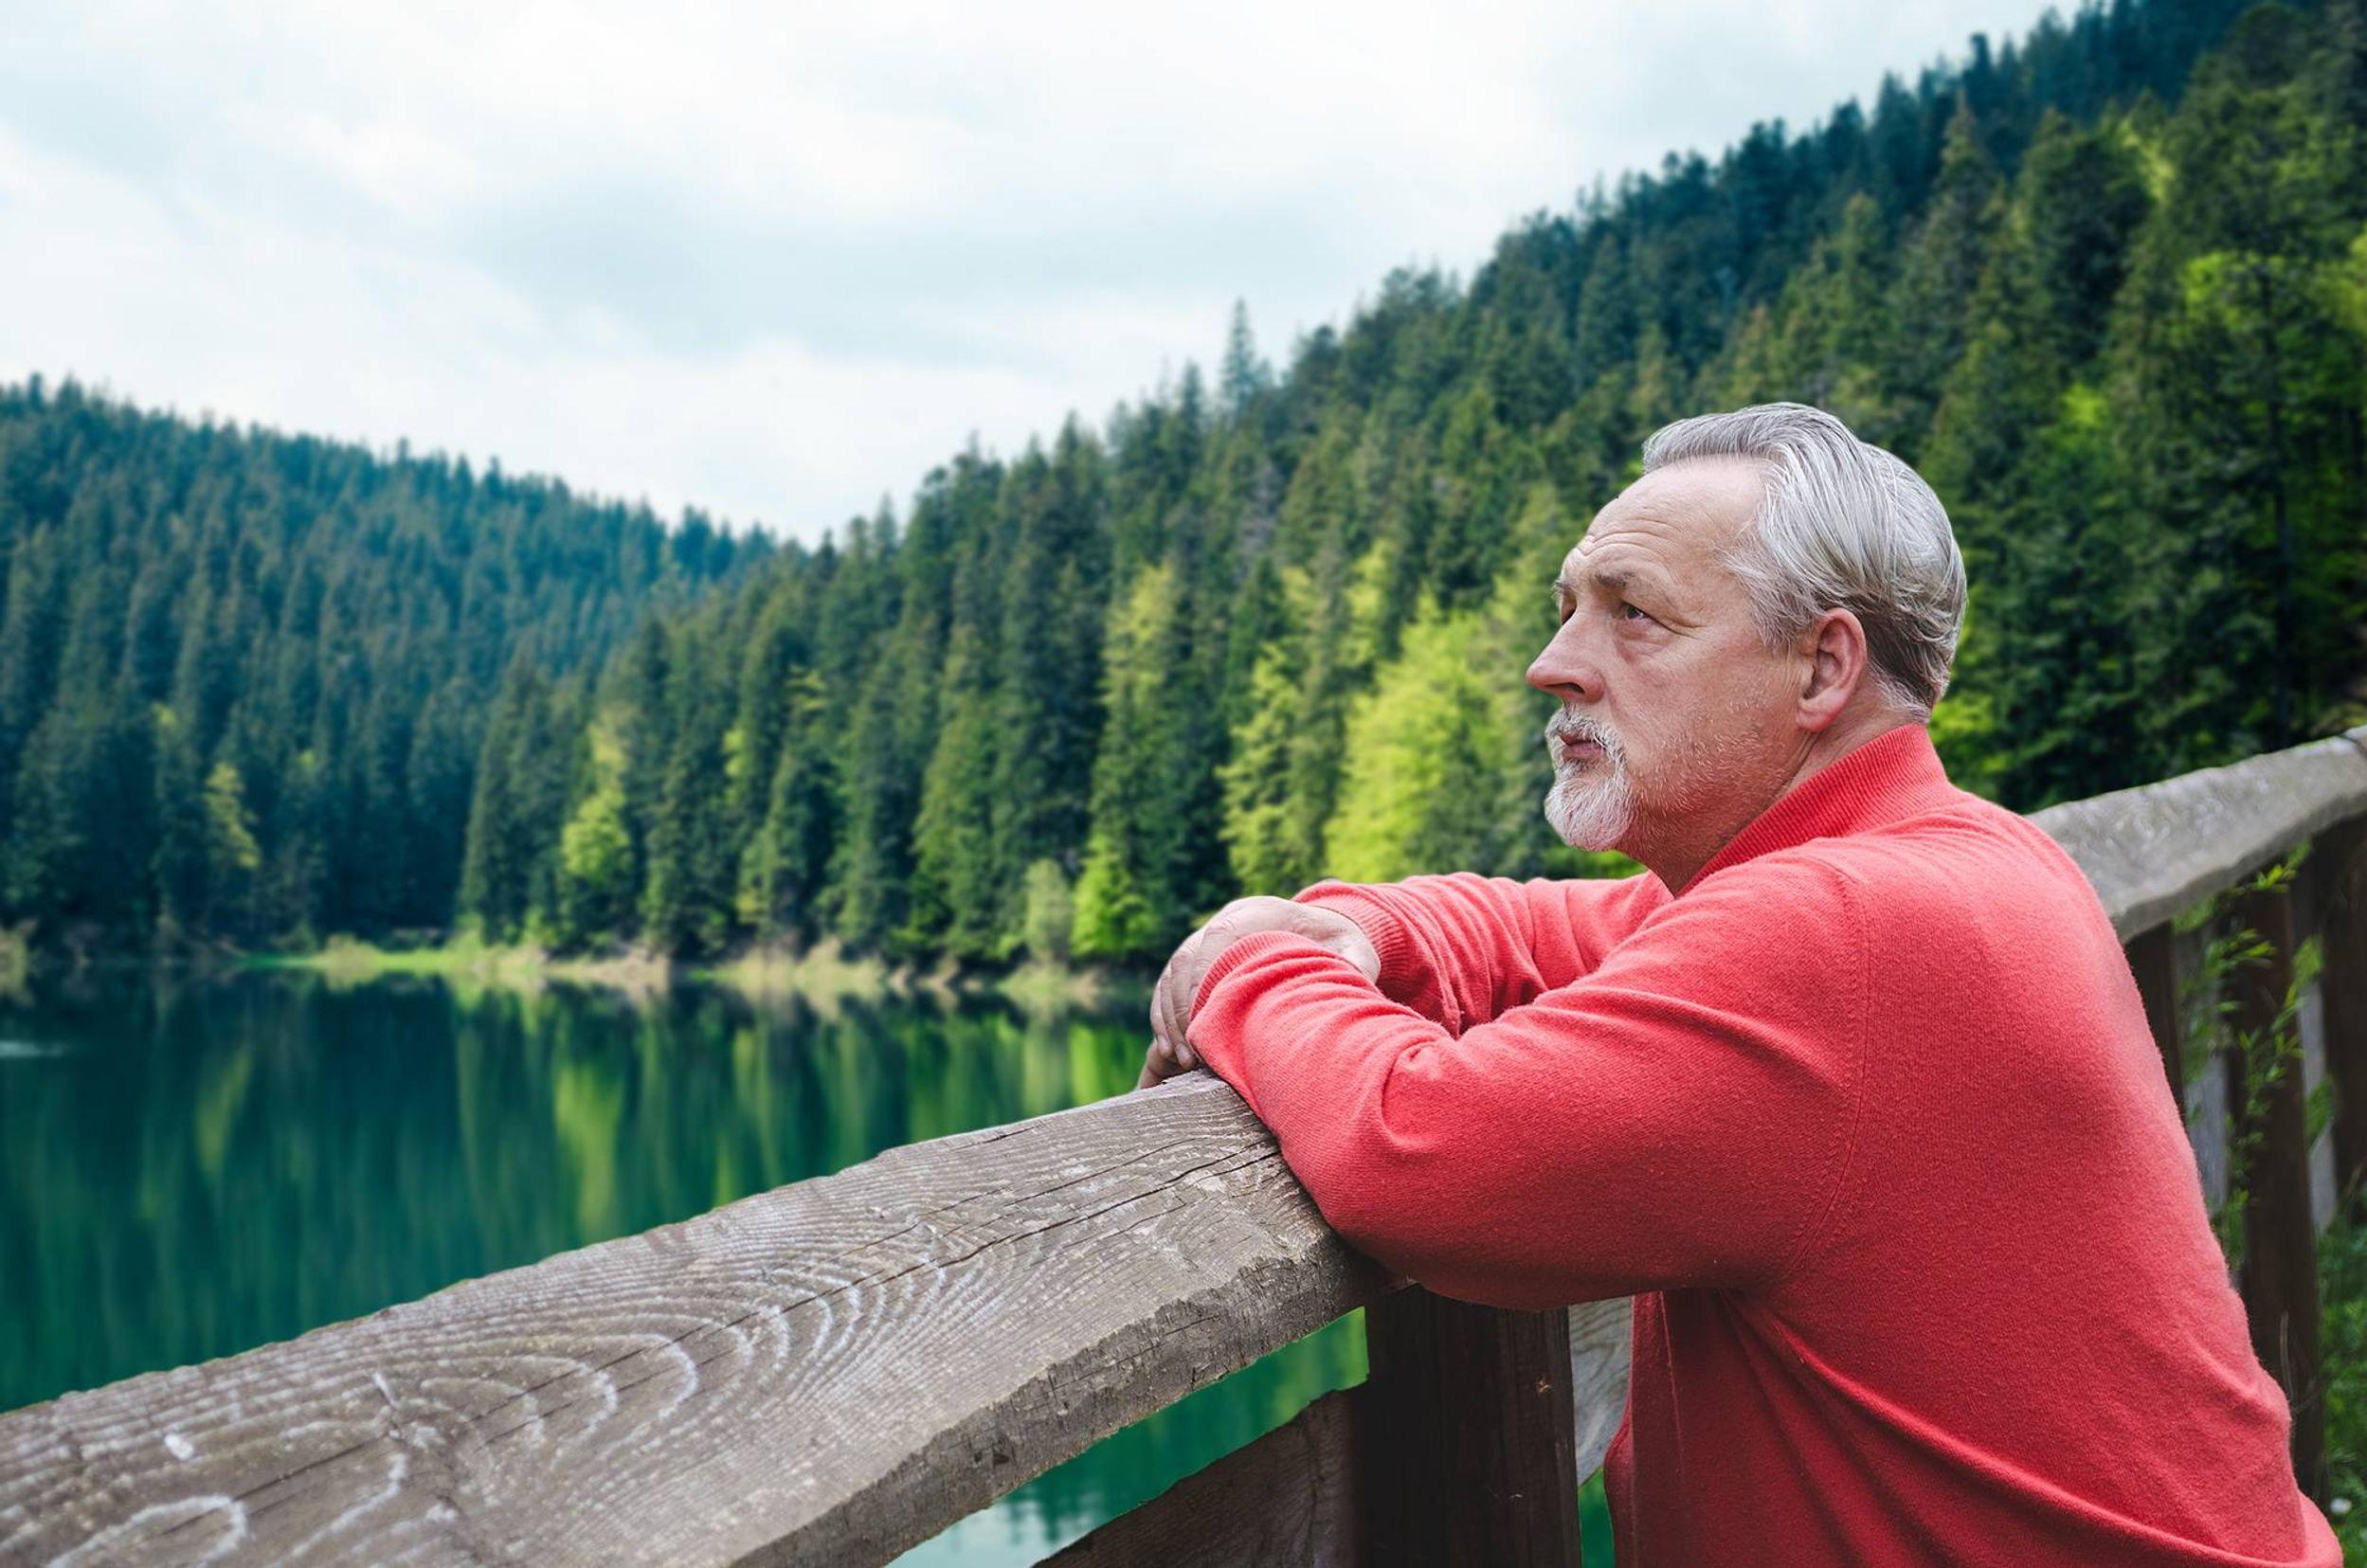 man in nature, looking pensive